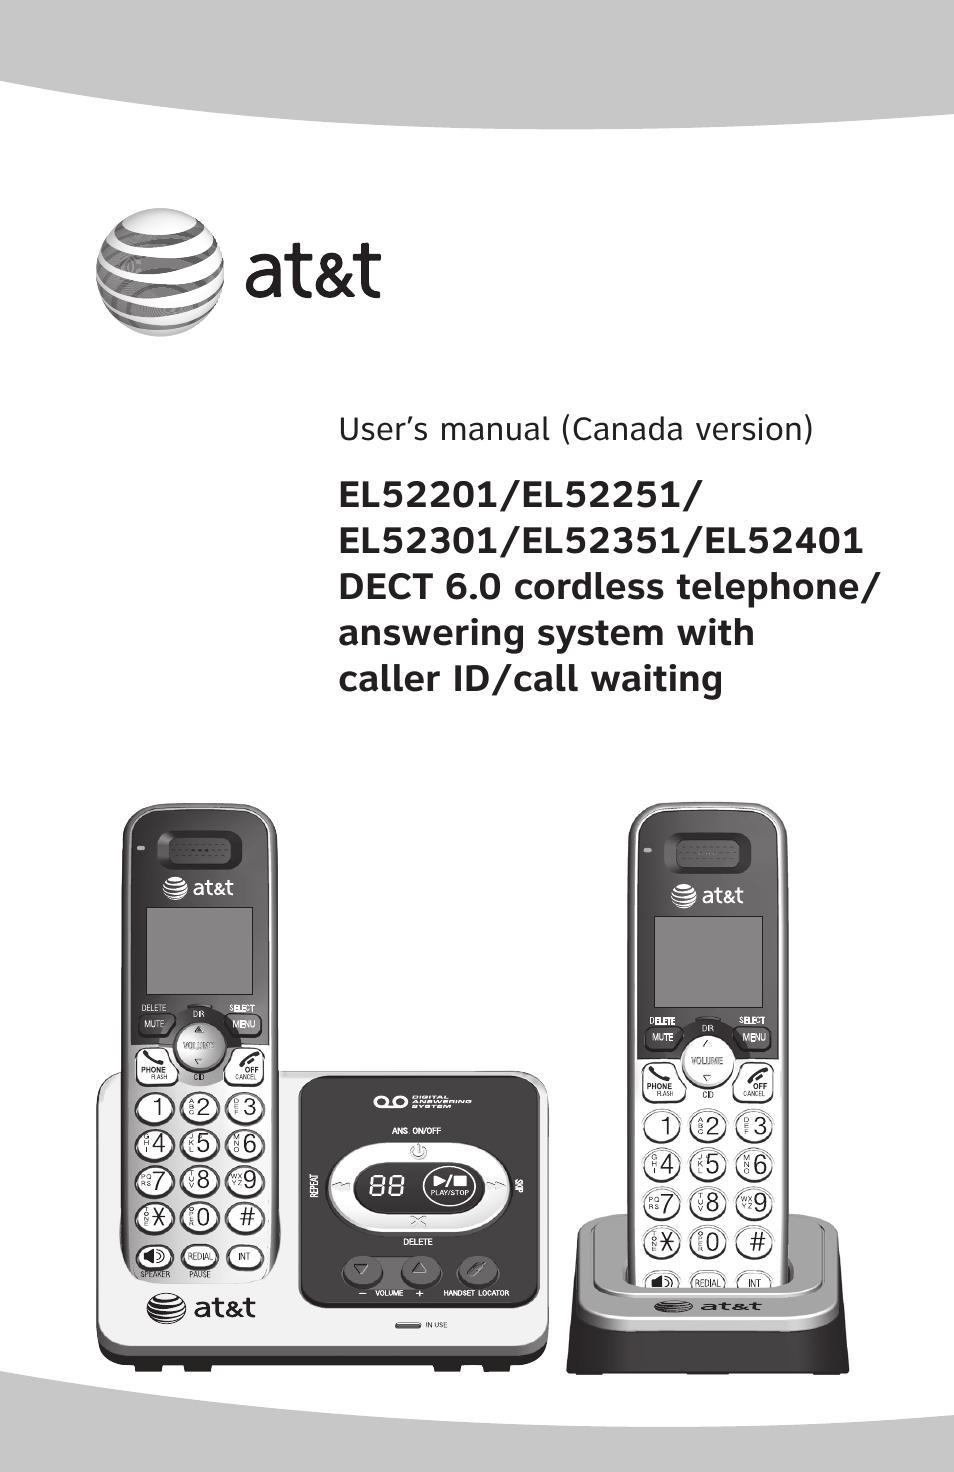 att phone dect 6 0 manual free owners manual u2022 rh wordworksbysea com at&t wireless home phone user guide at&t dect 6.0 phone user manual